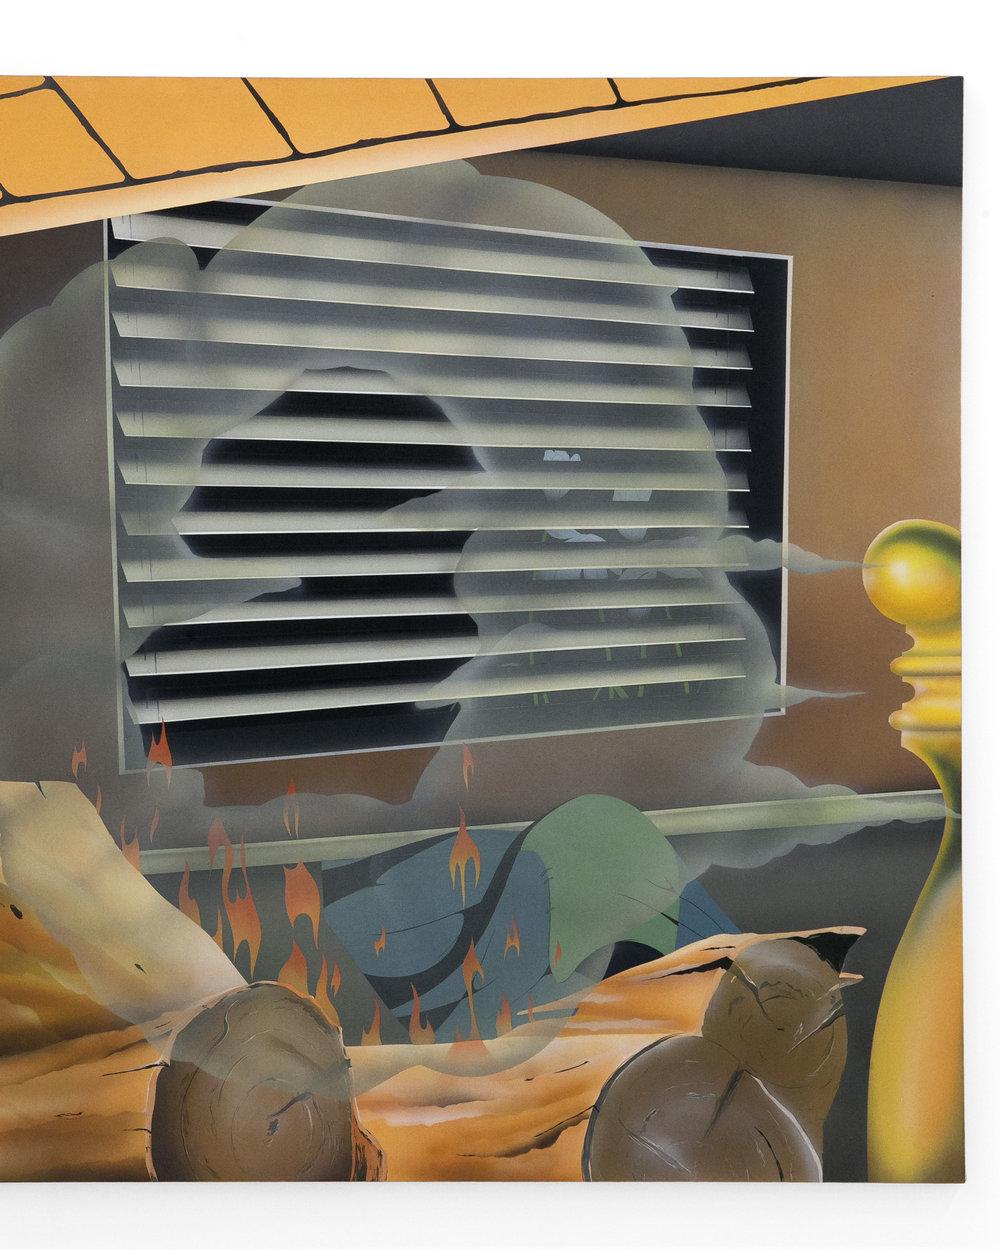 aej_lrg_fireplace_canvas_2.jpg